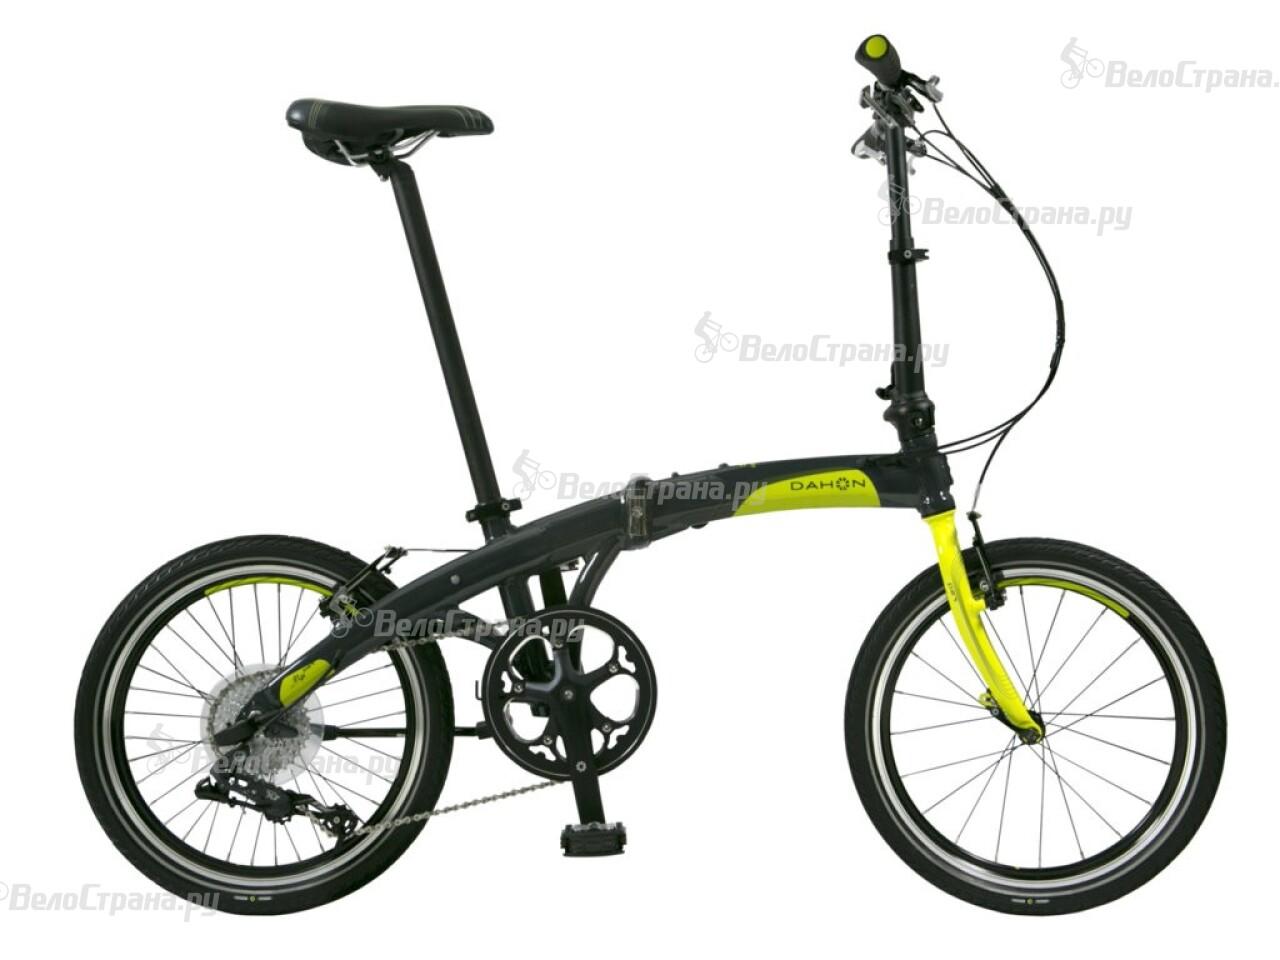 Велосипед Dahon Mu P27 (2014) велосипед dahon ciao d7 2014